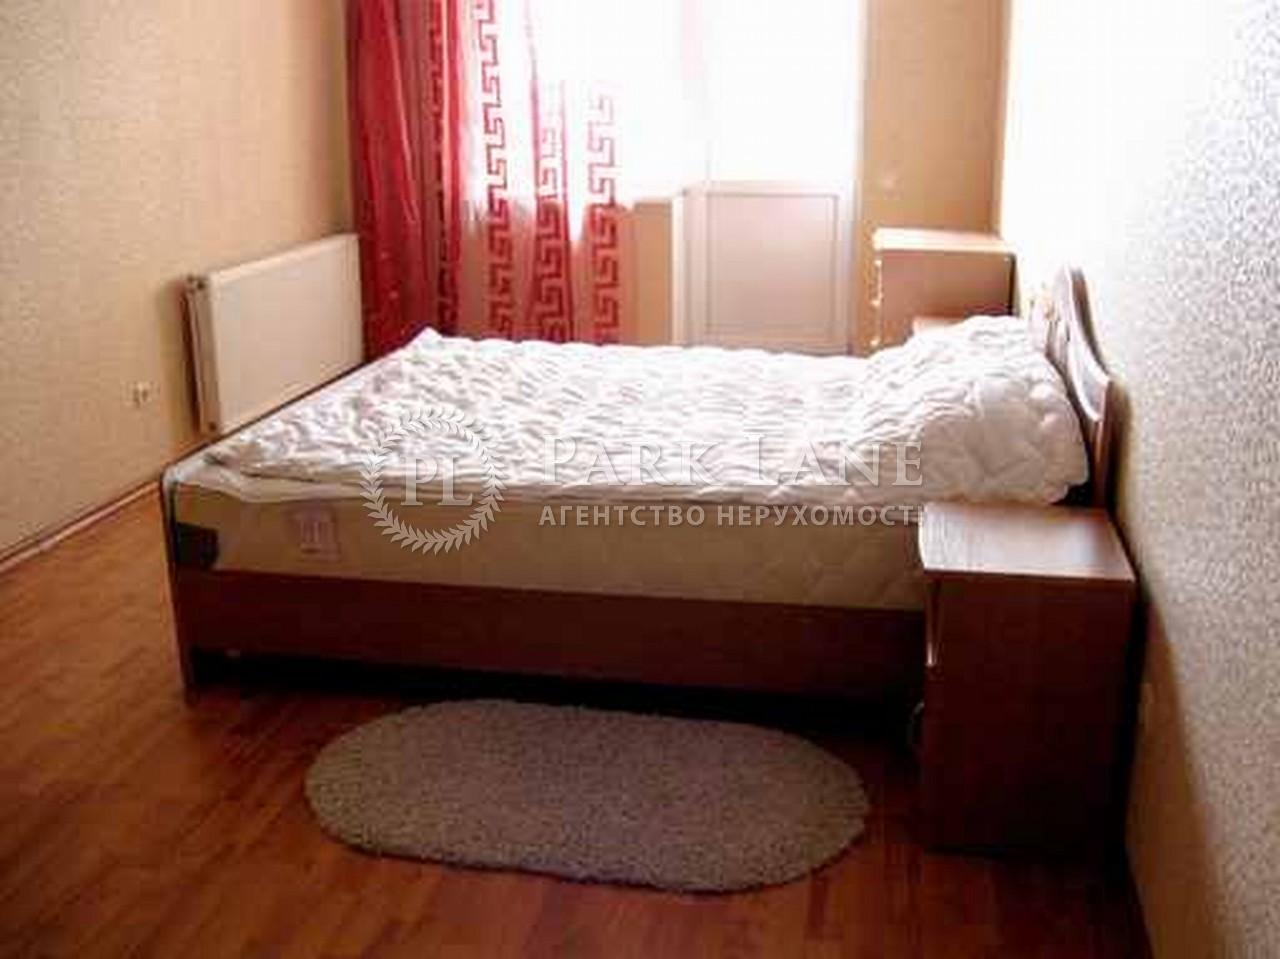 Квартира ул. Павловская, 17, Киев, Z-1460852 - Фото 7